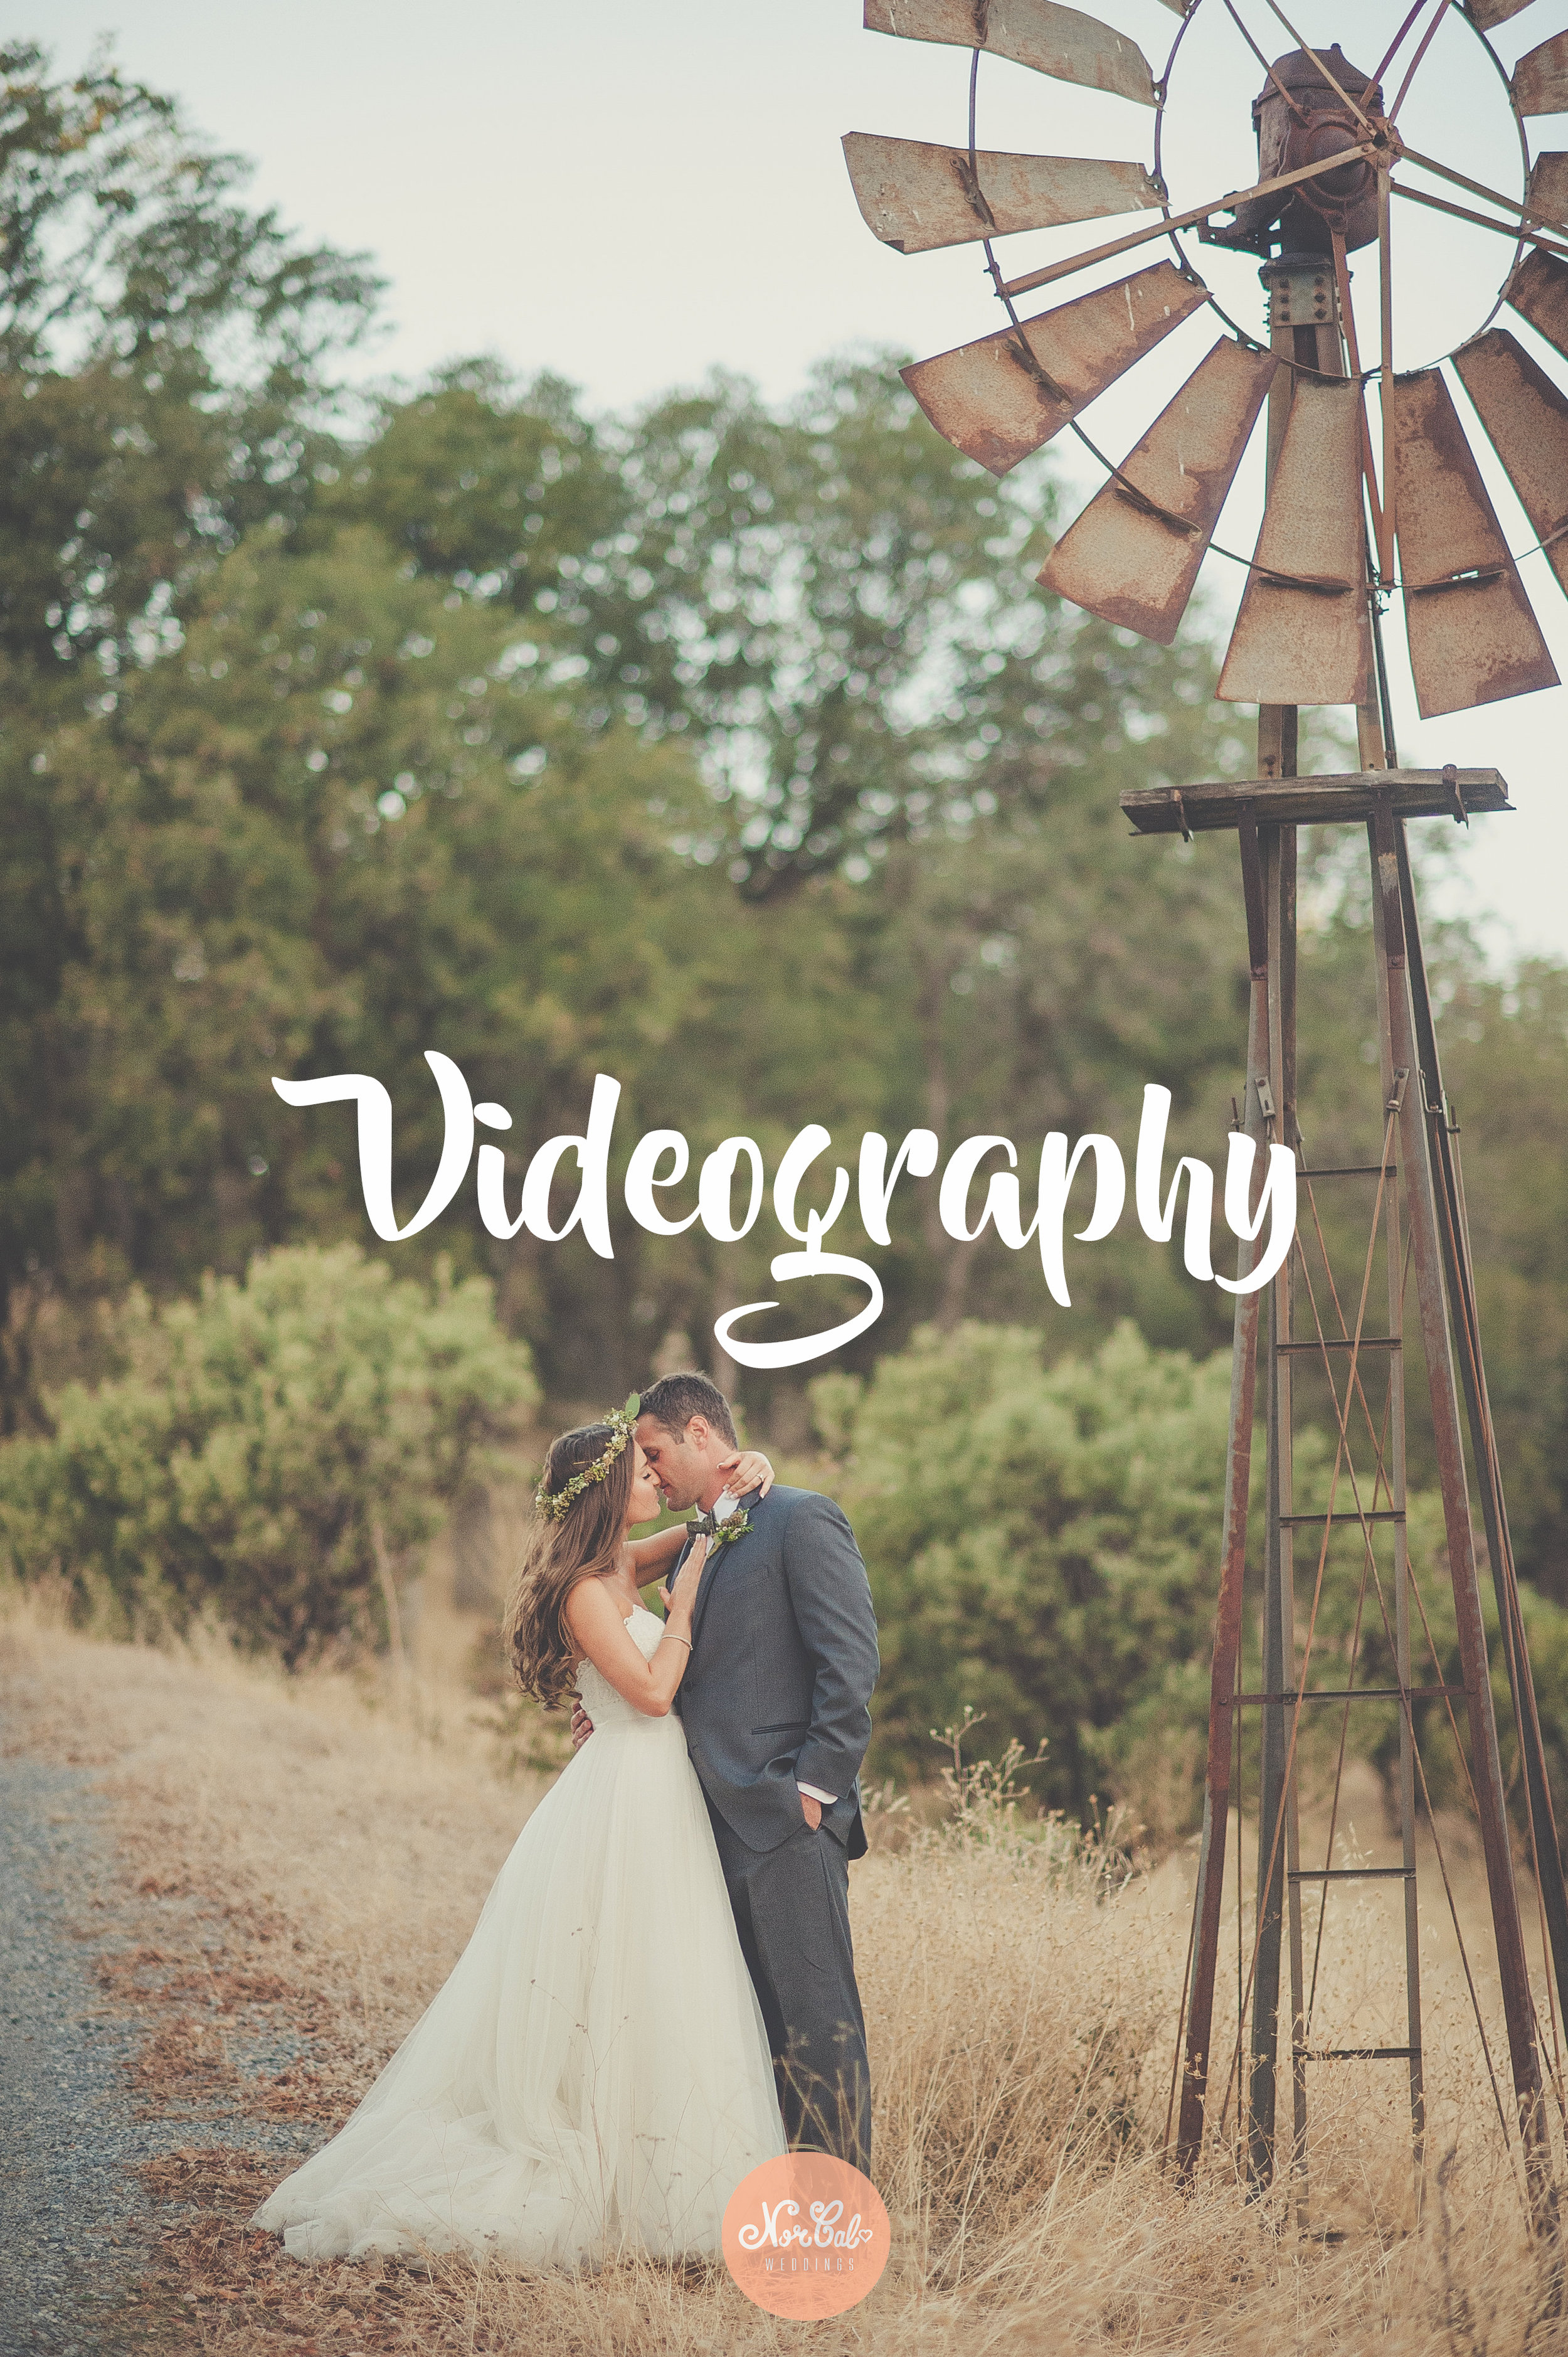 NorCal Weddings Videography Services.jpg